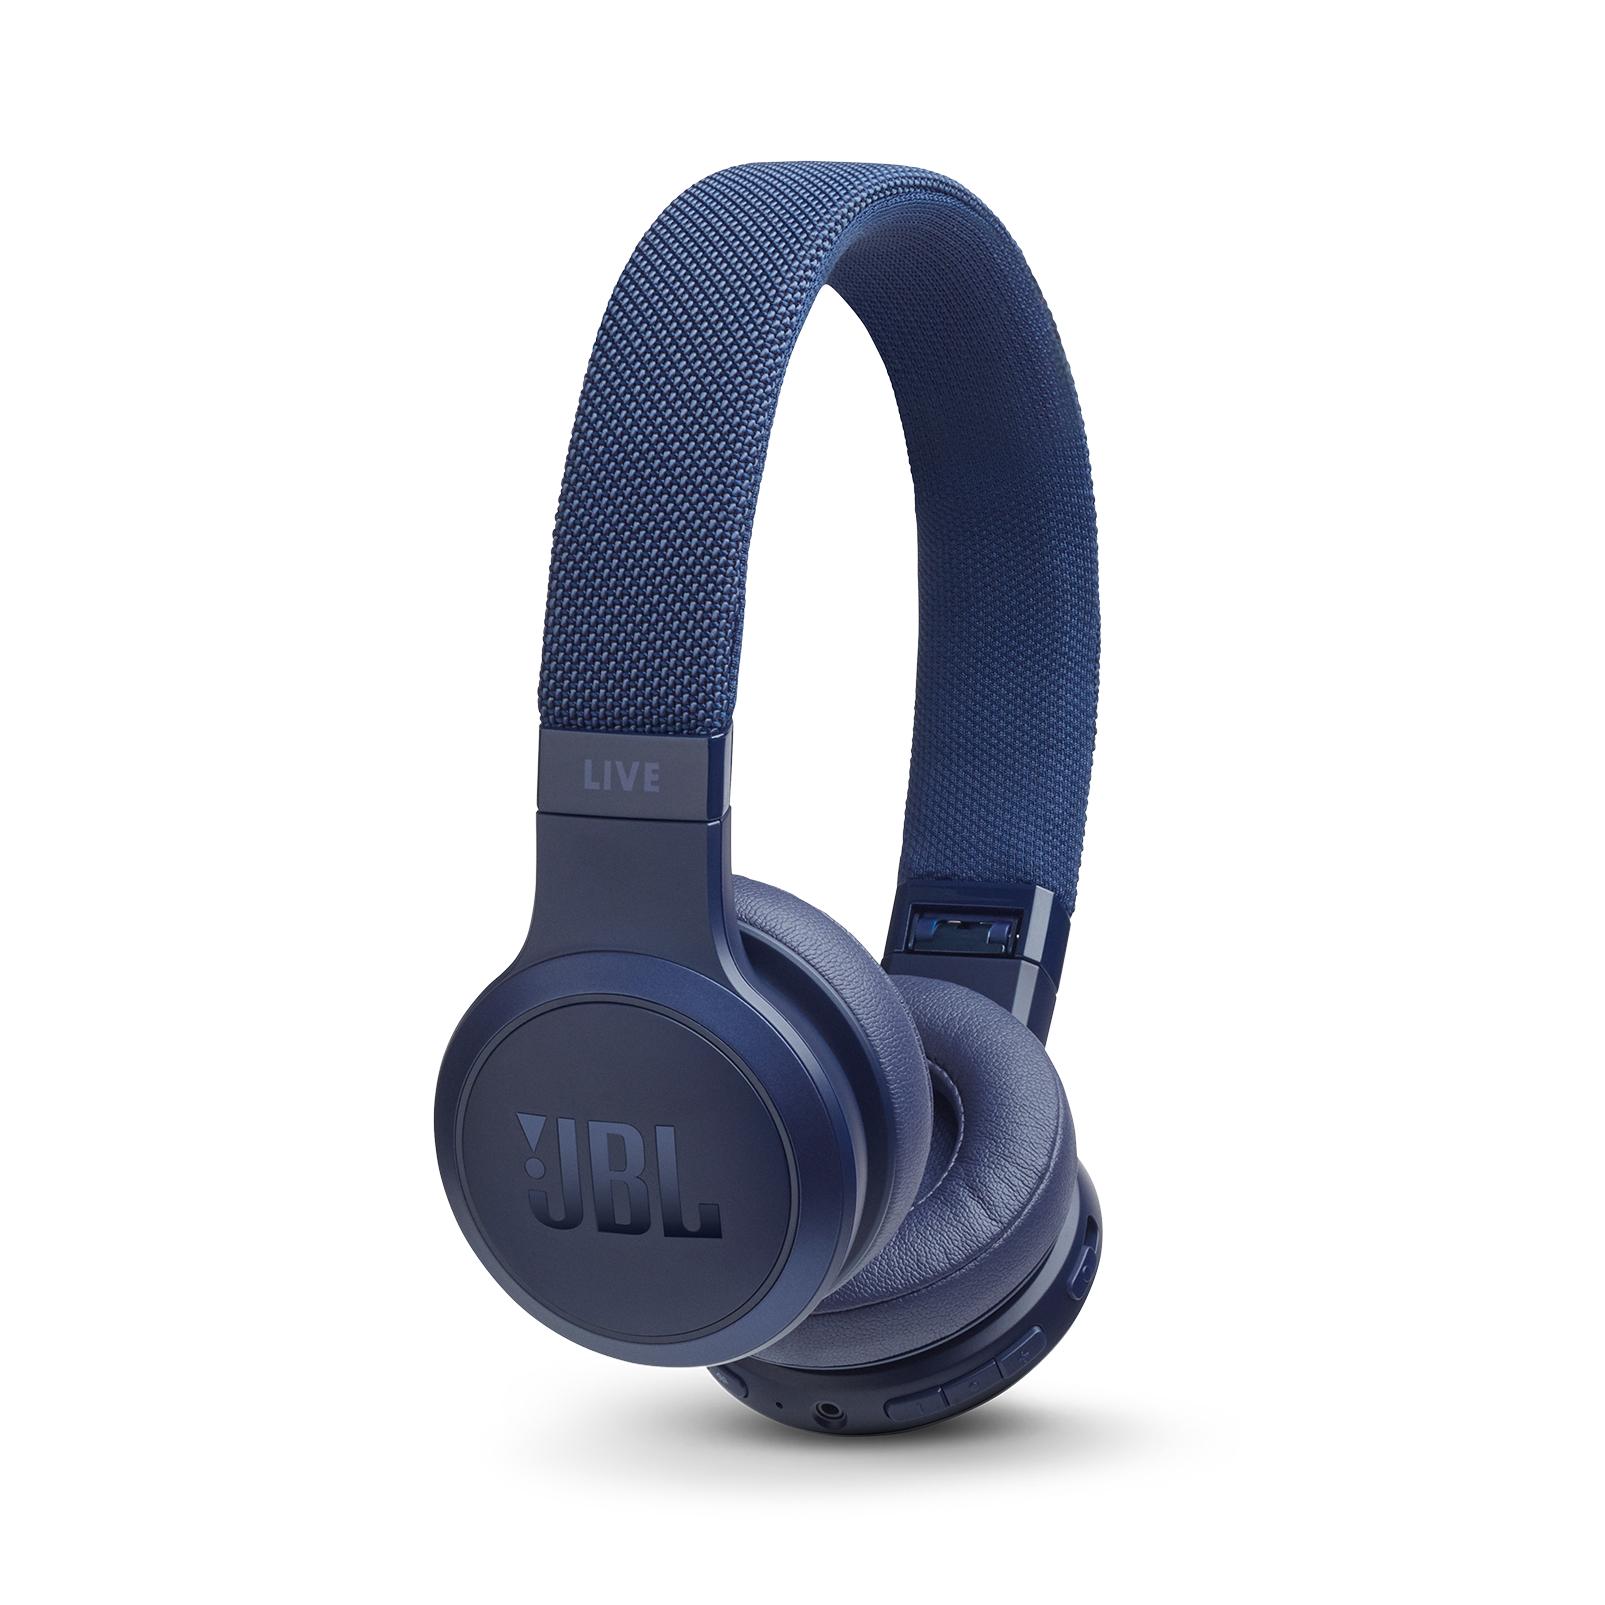 Casque audio sans fil JBL Live 400BT - Bluetooth